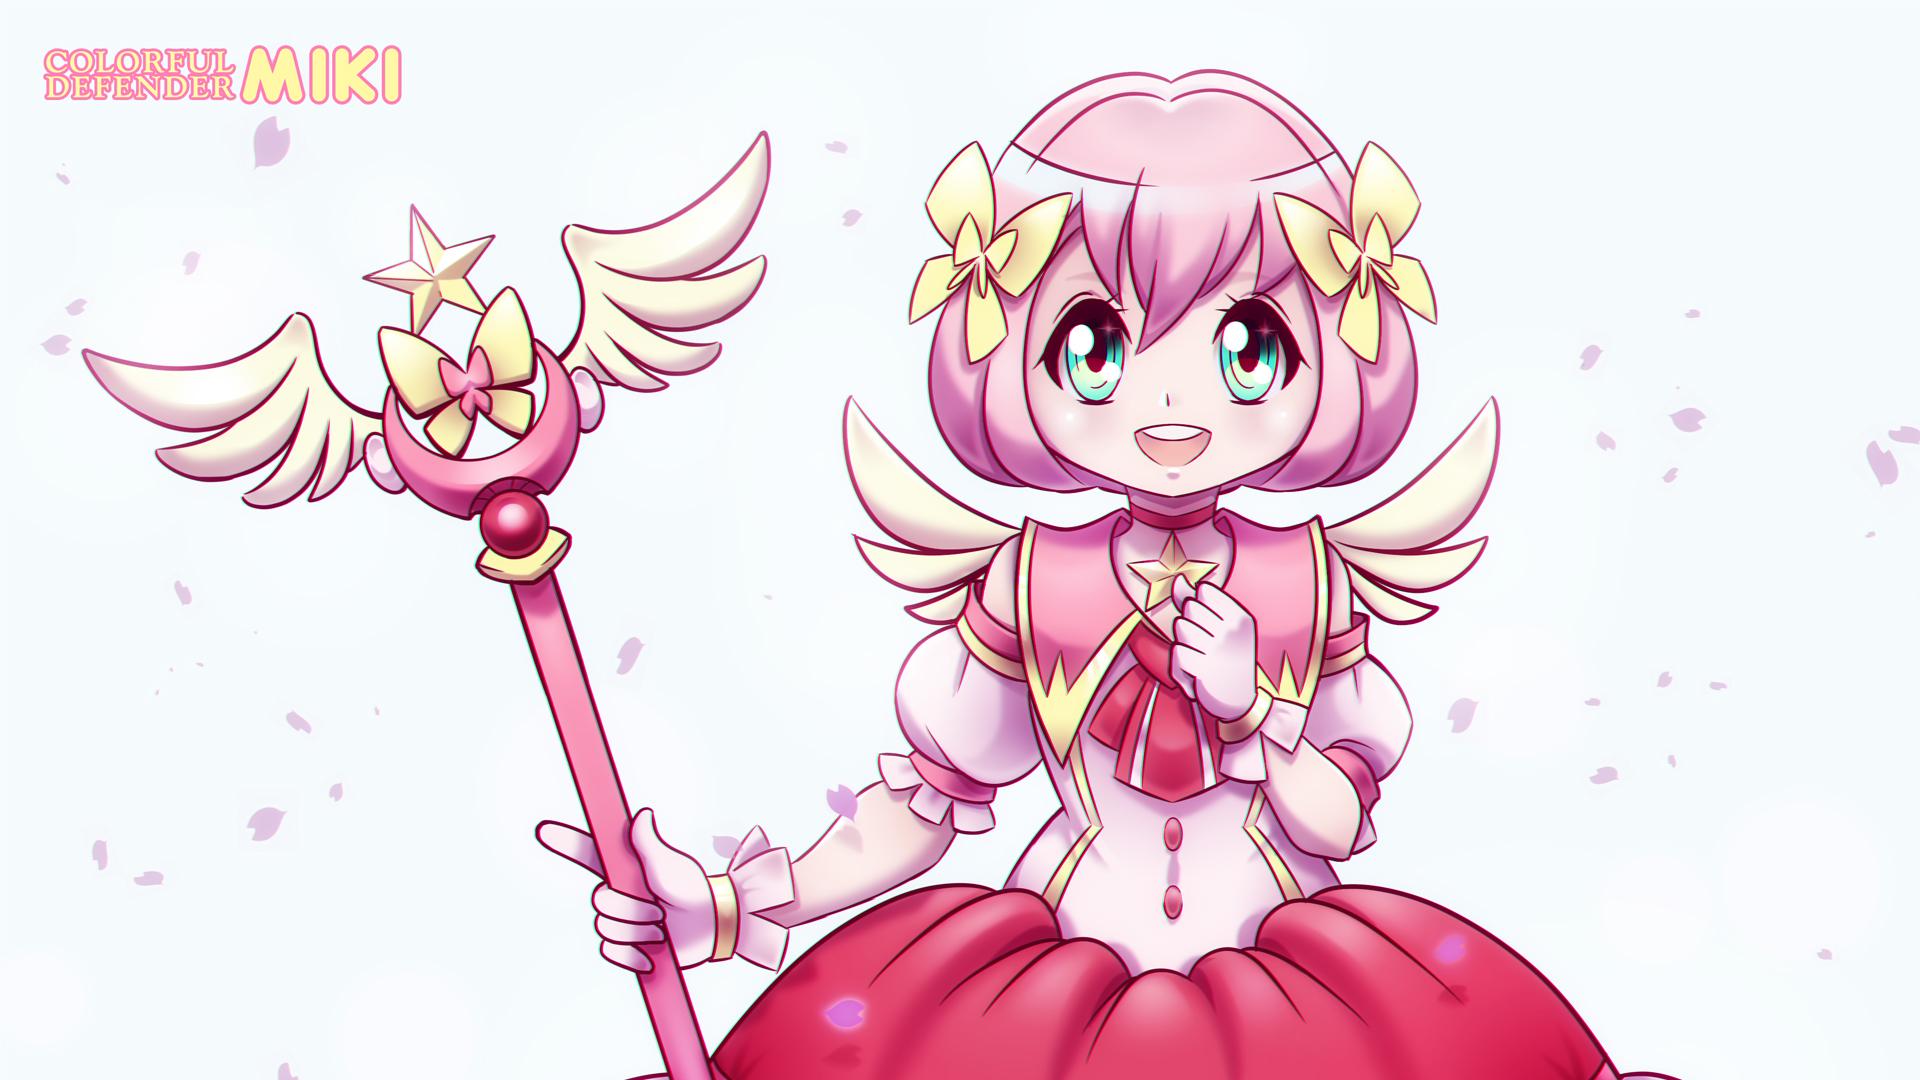 Colorful Defender Miki